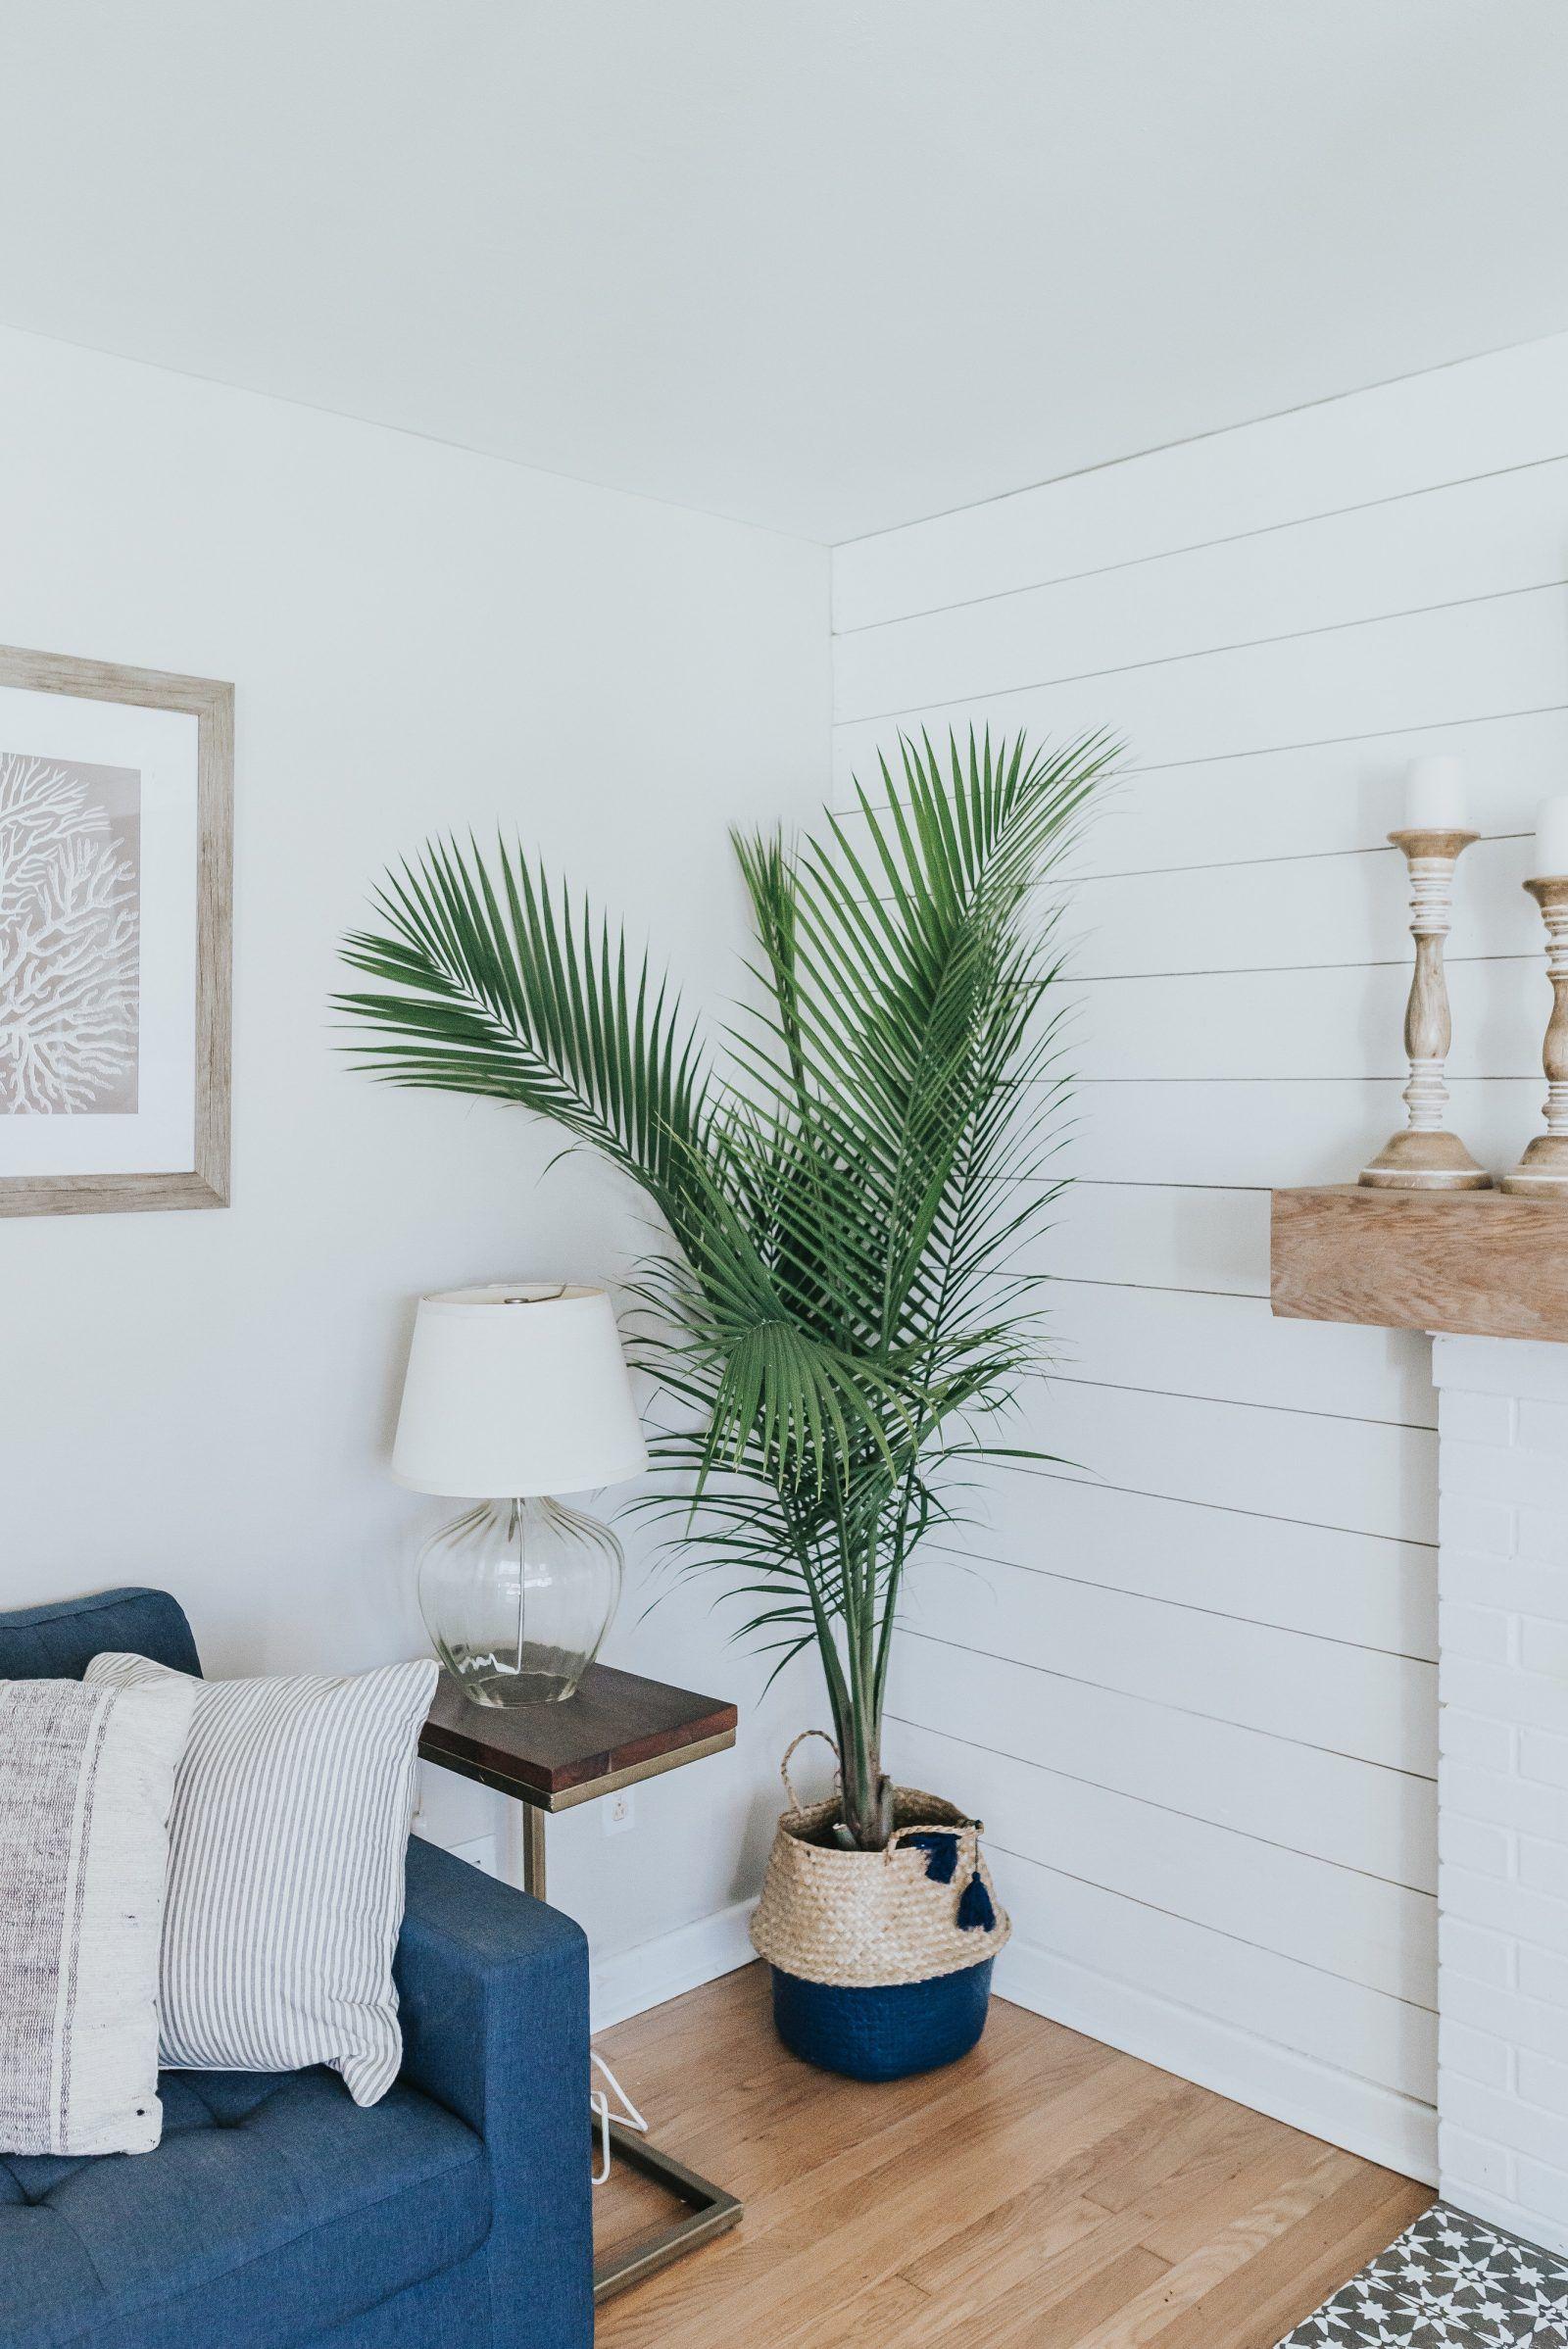 Coastal remodel jettset farmhouse bedroom wall colors